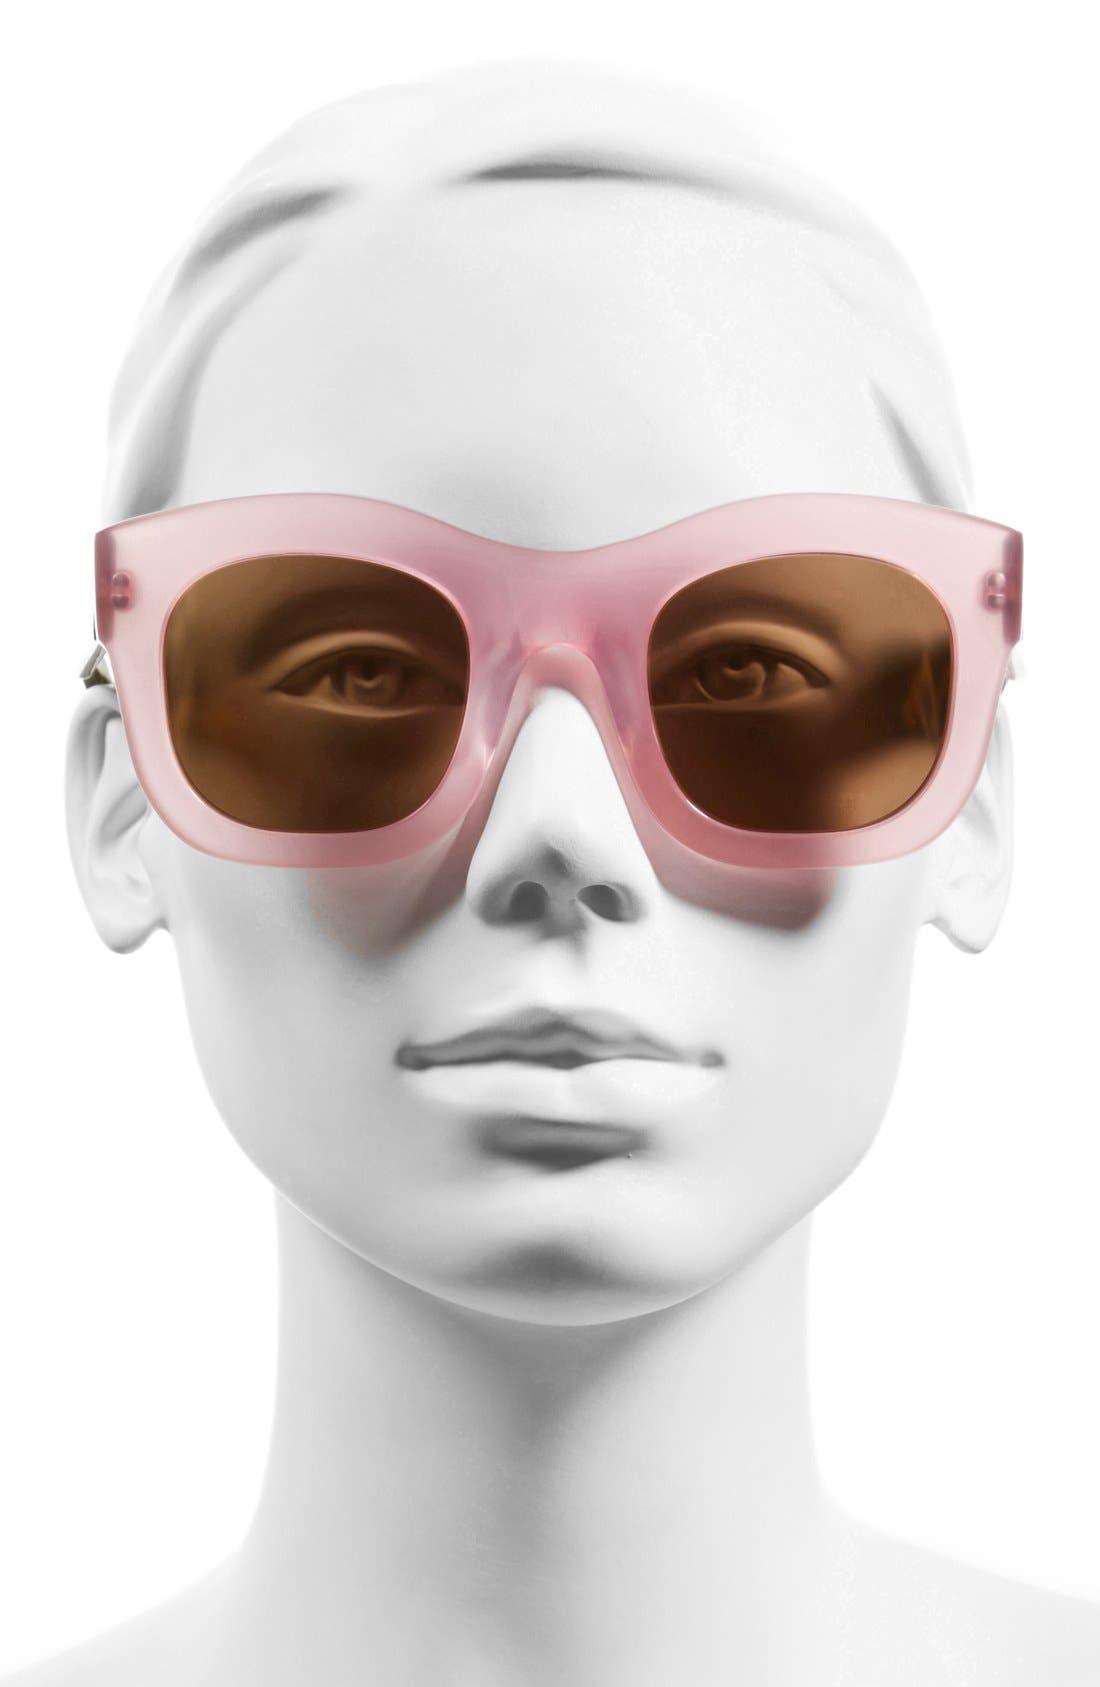 'Hamilton' 49mm Retro Sunglasses,                             Alternate thumbnail 20, color,